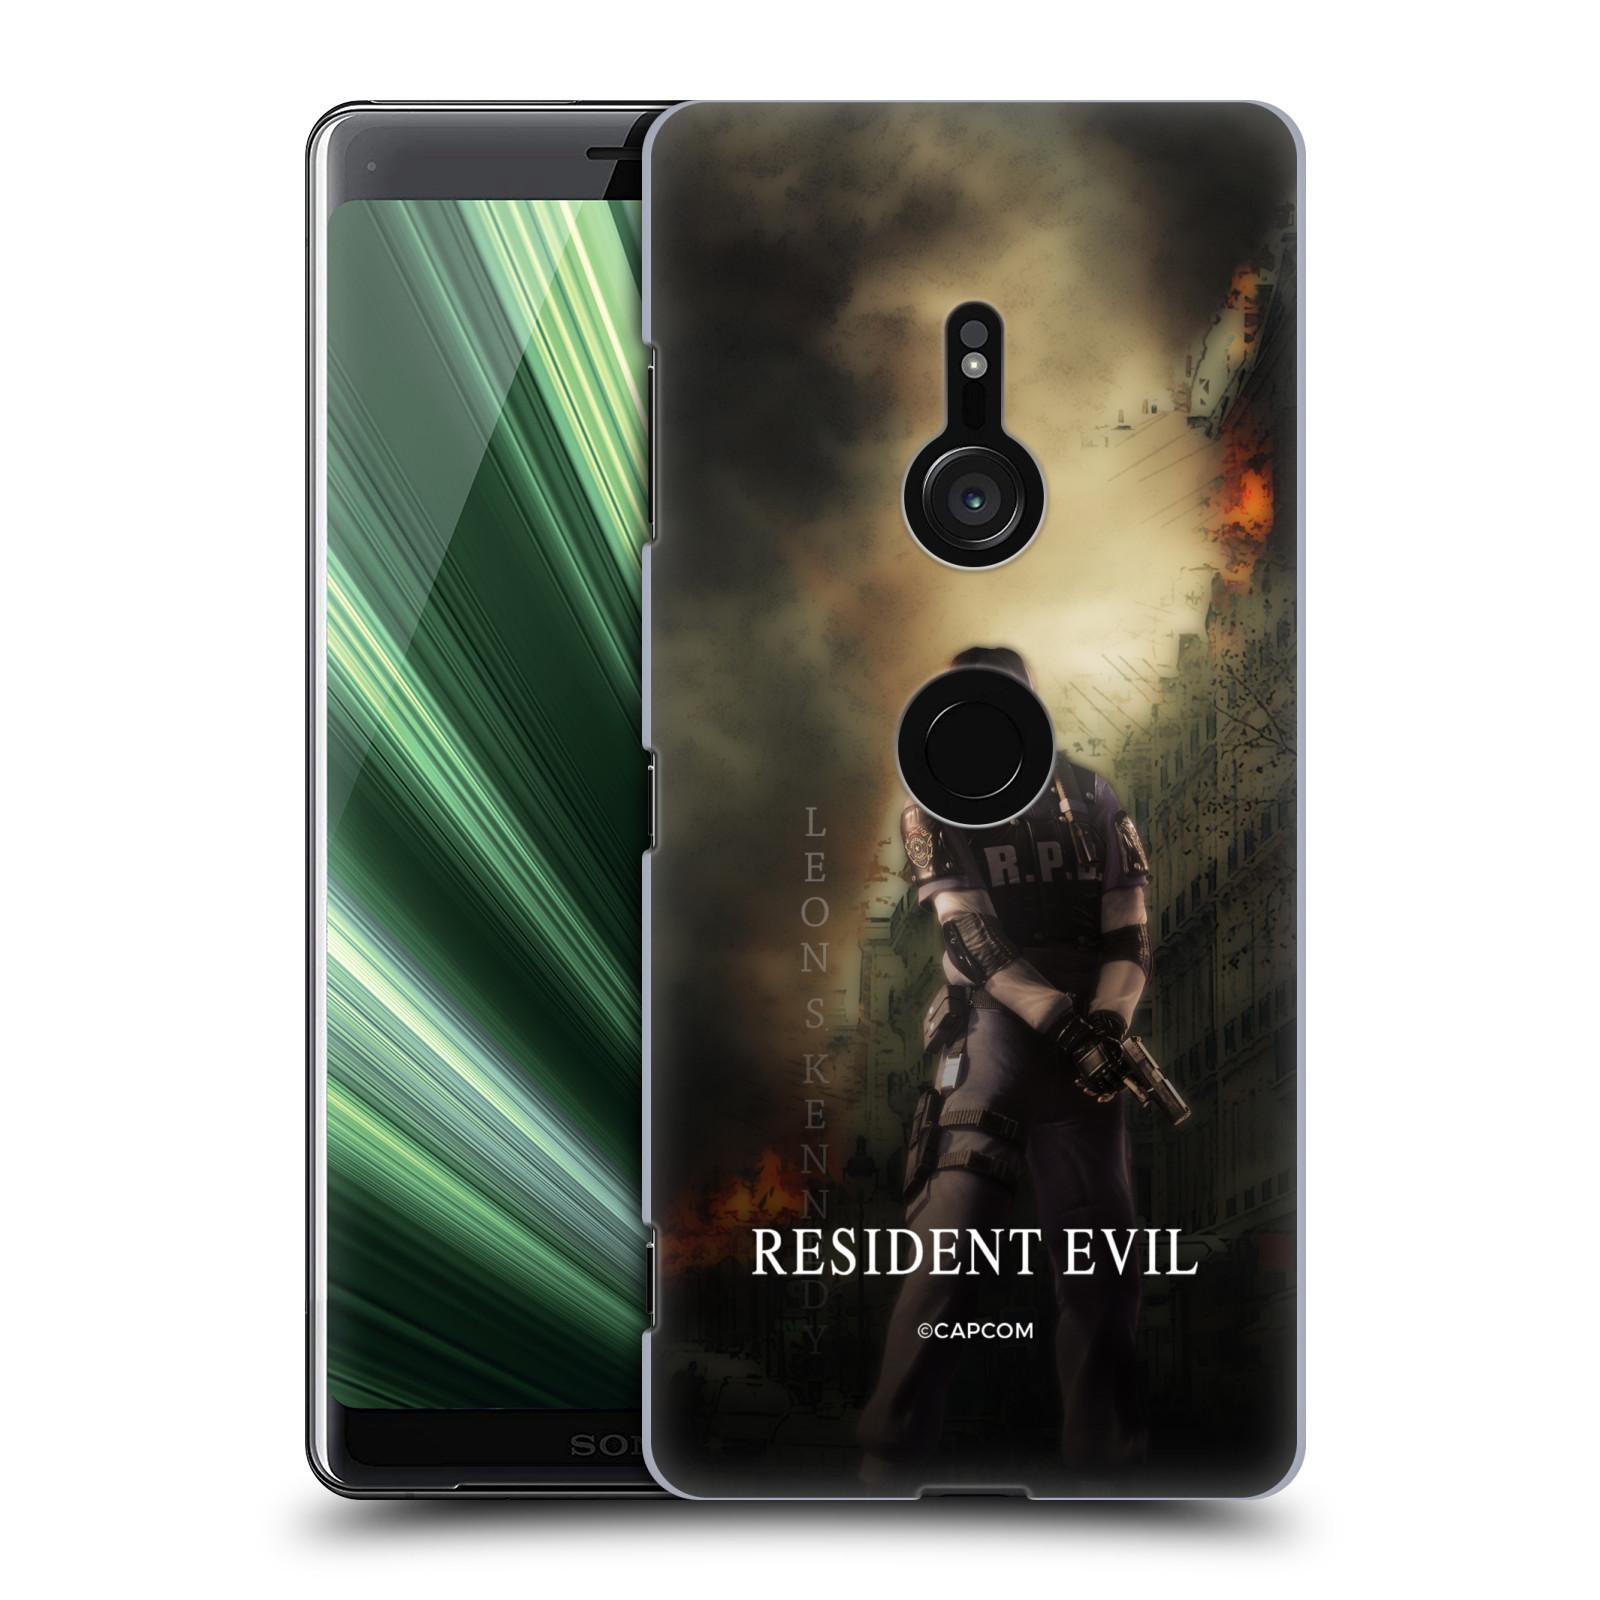 Pouzdro na mobil Sony Xperia XZ3 Resident Evil Leon S. Kennedy